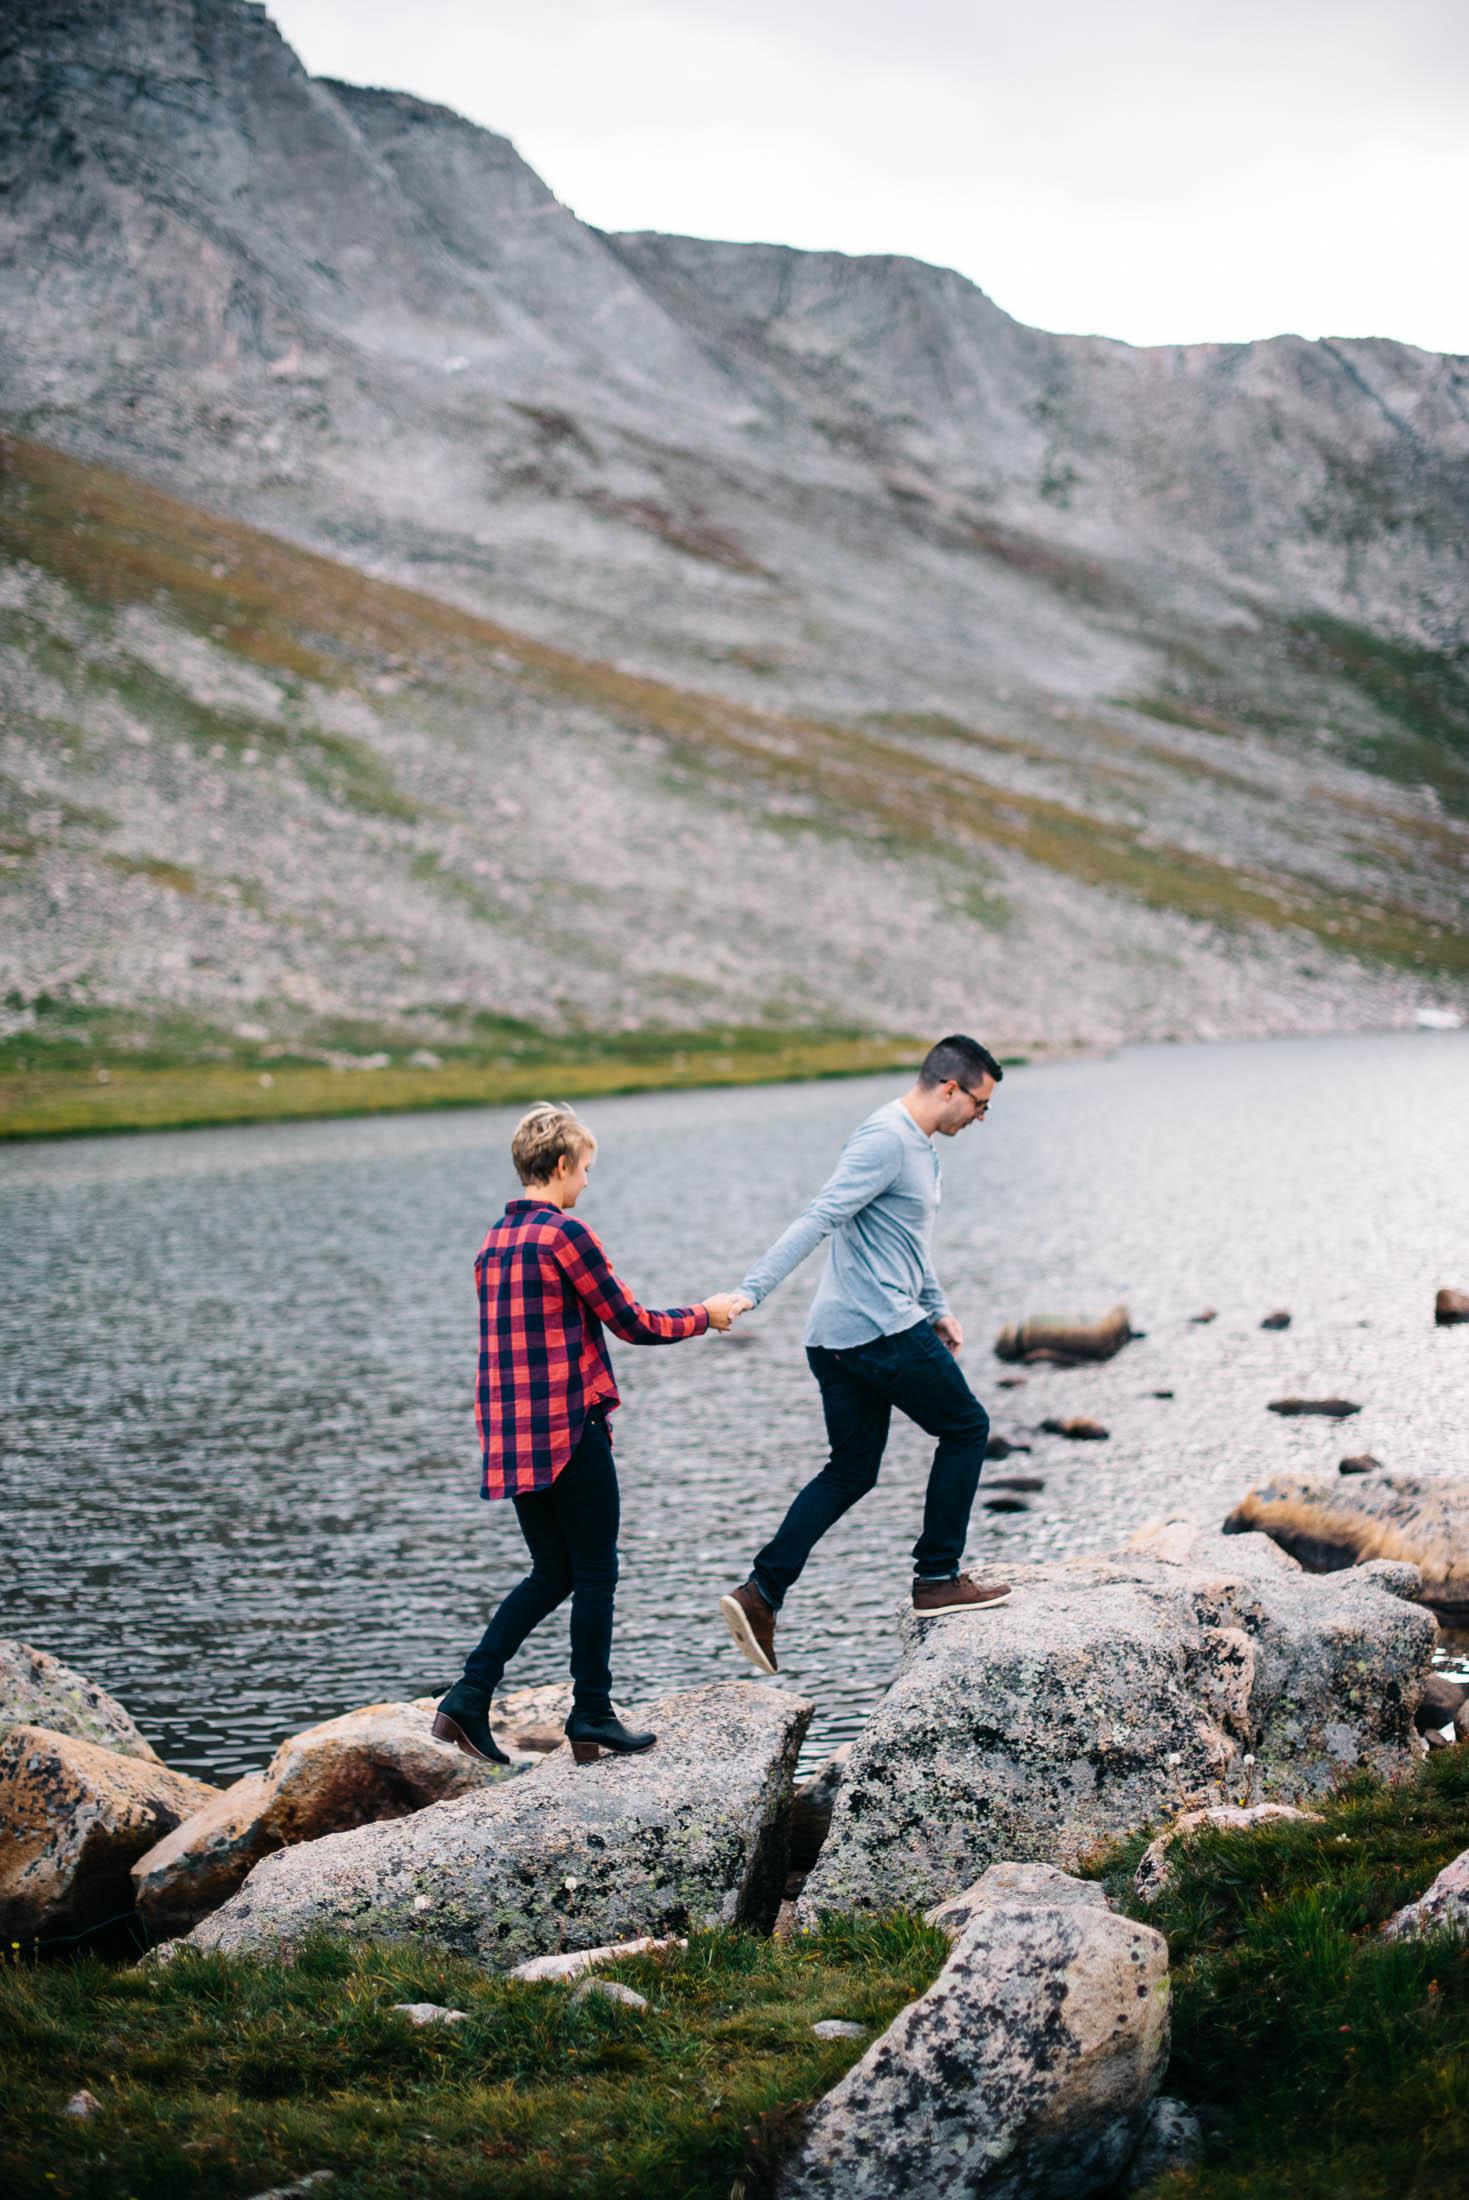 41-44couple-anniversary-engagement-photographer-colorado-Jeremy&Lindsay-Tosh-August2017-0112.jpg